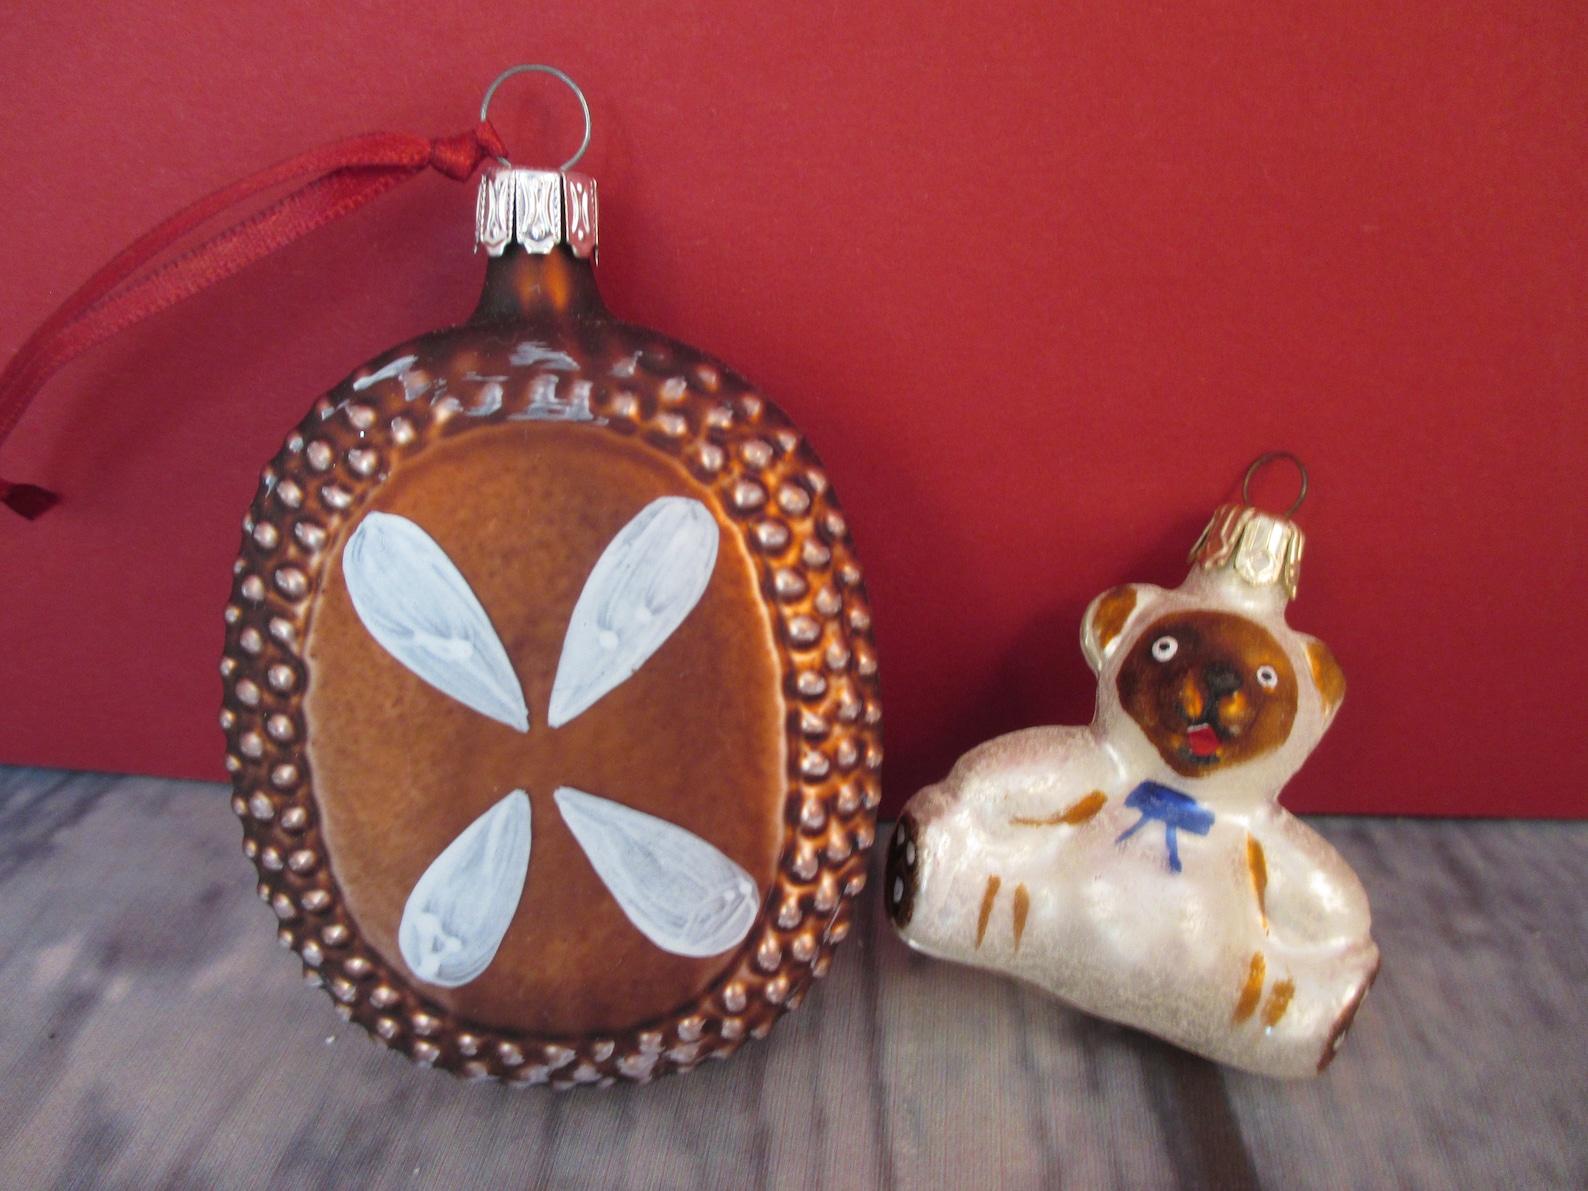 Lebkuchen Ornament & Teddy Bear Gingerbread Cookie German Glass Ornament Set